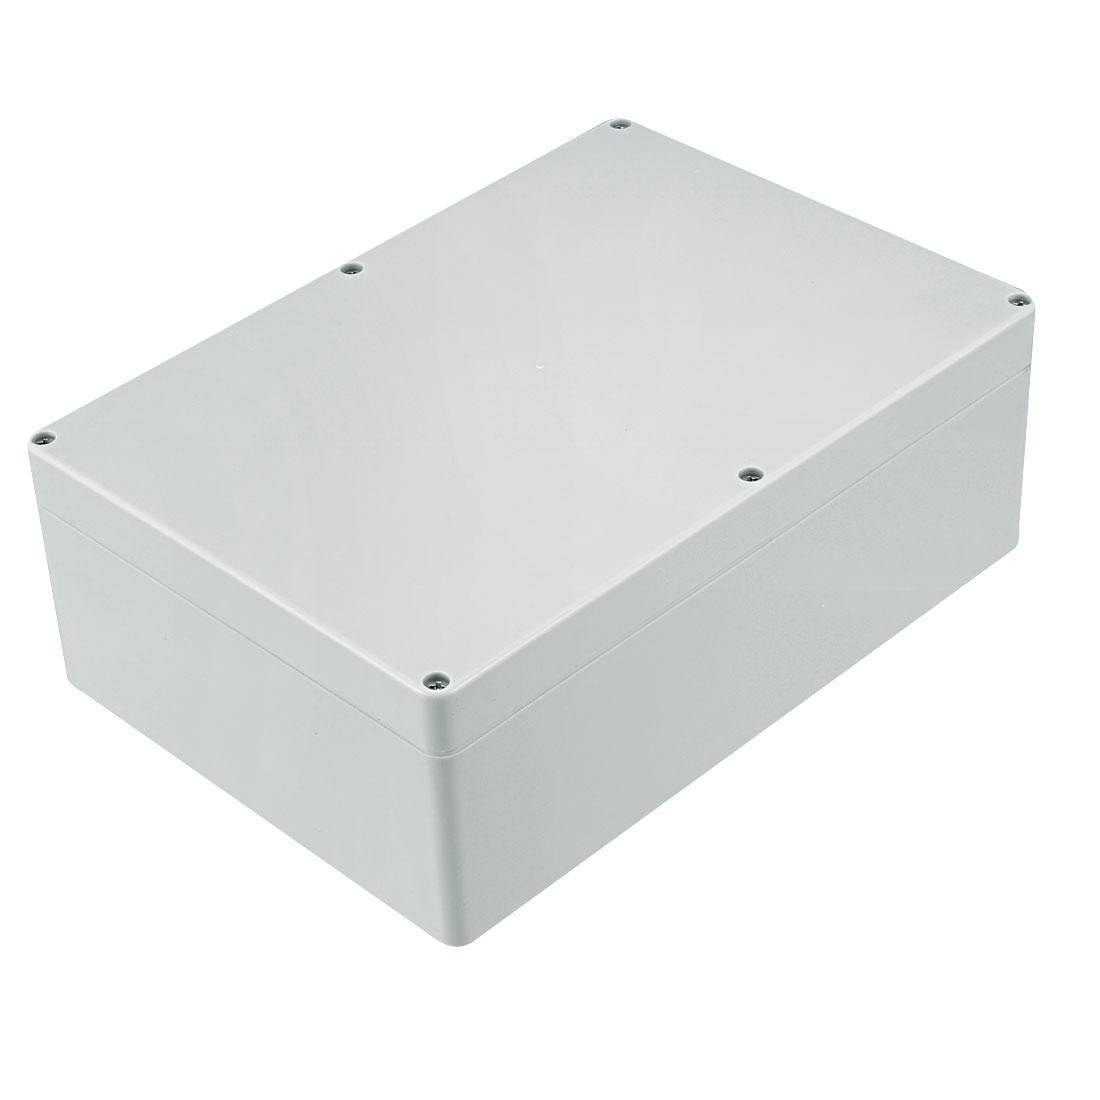 262 x 184 x 95mm Electronic Plastic DIY Junction Box Enclosure Case Gray